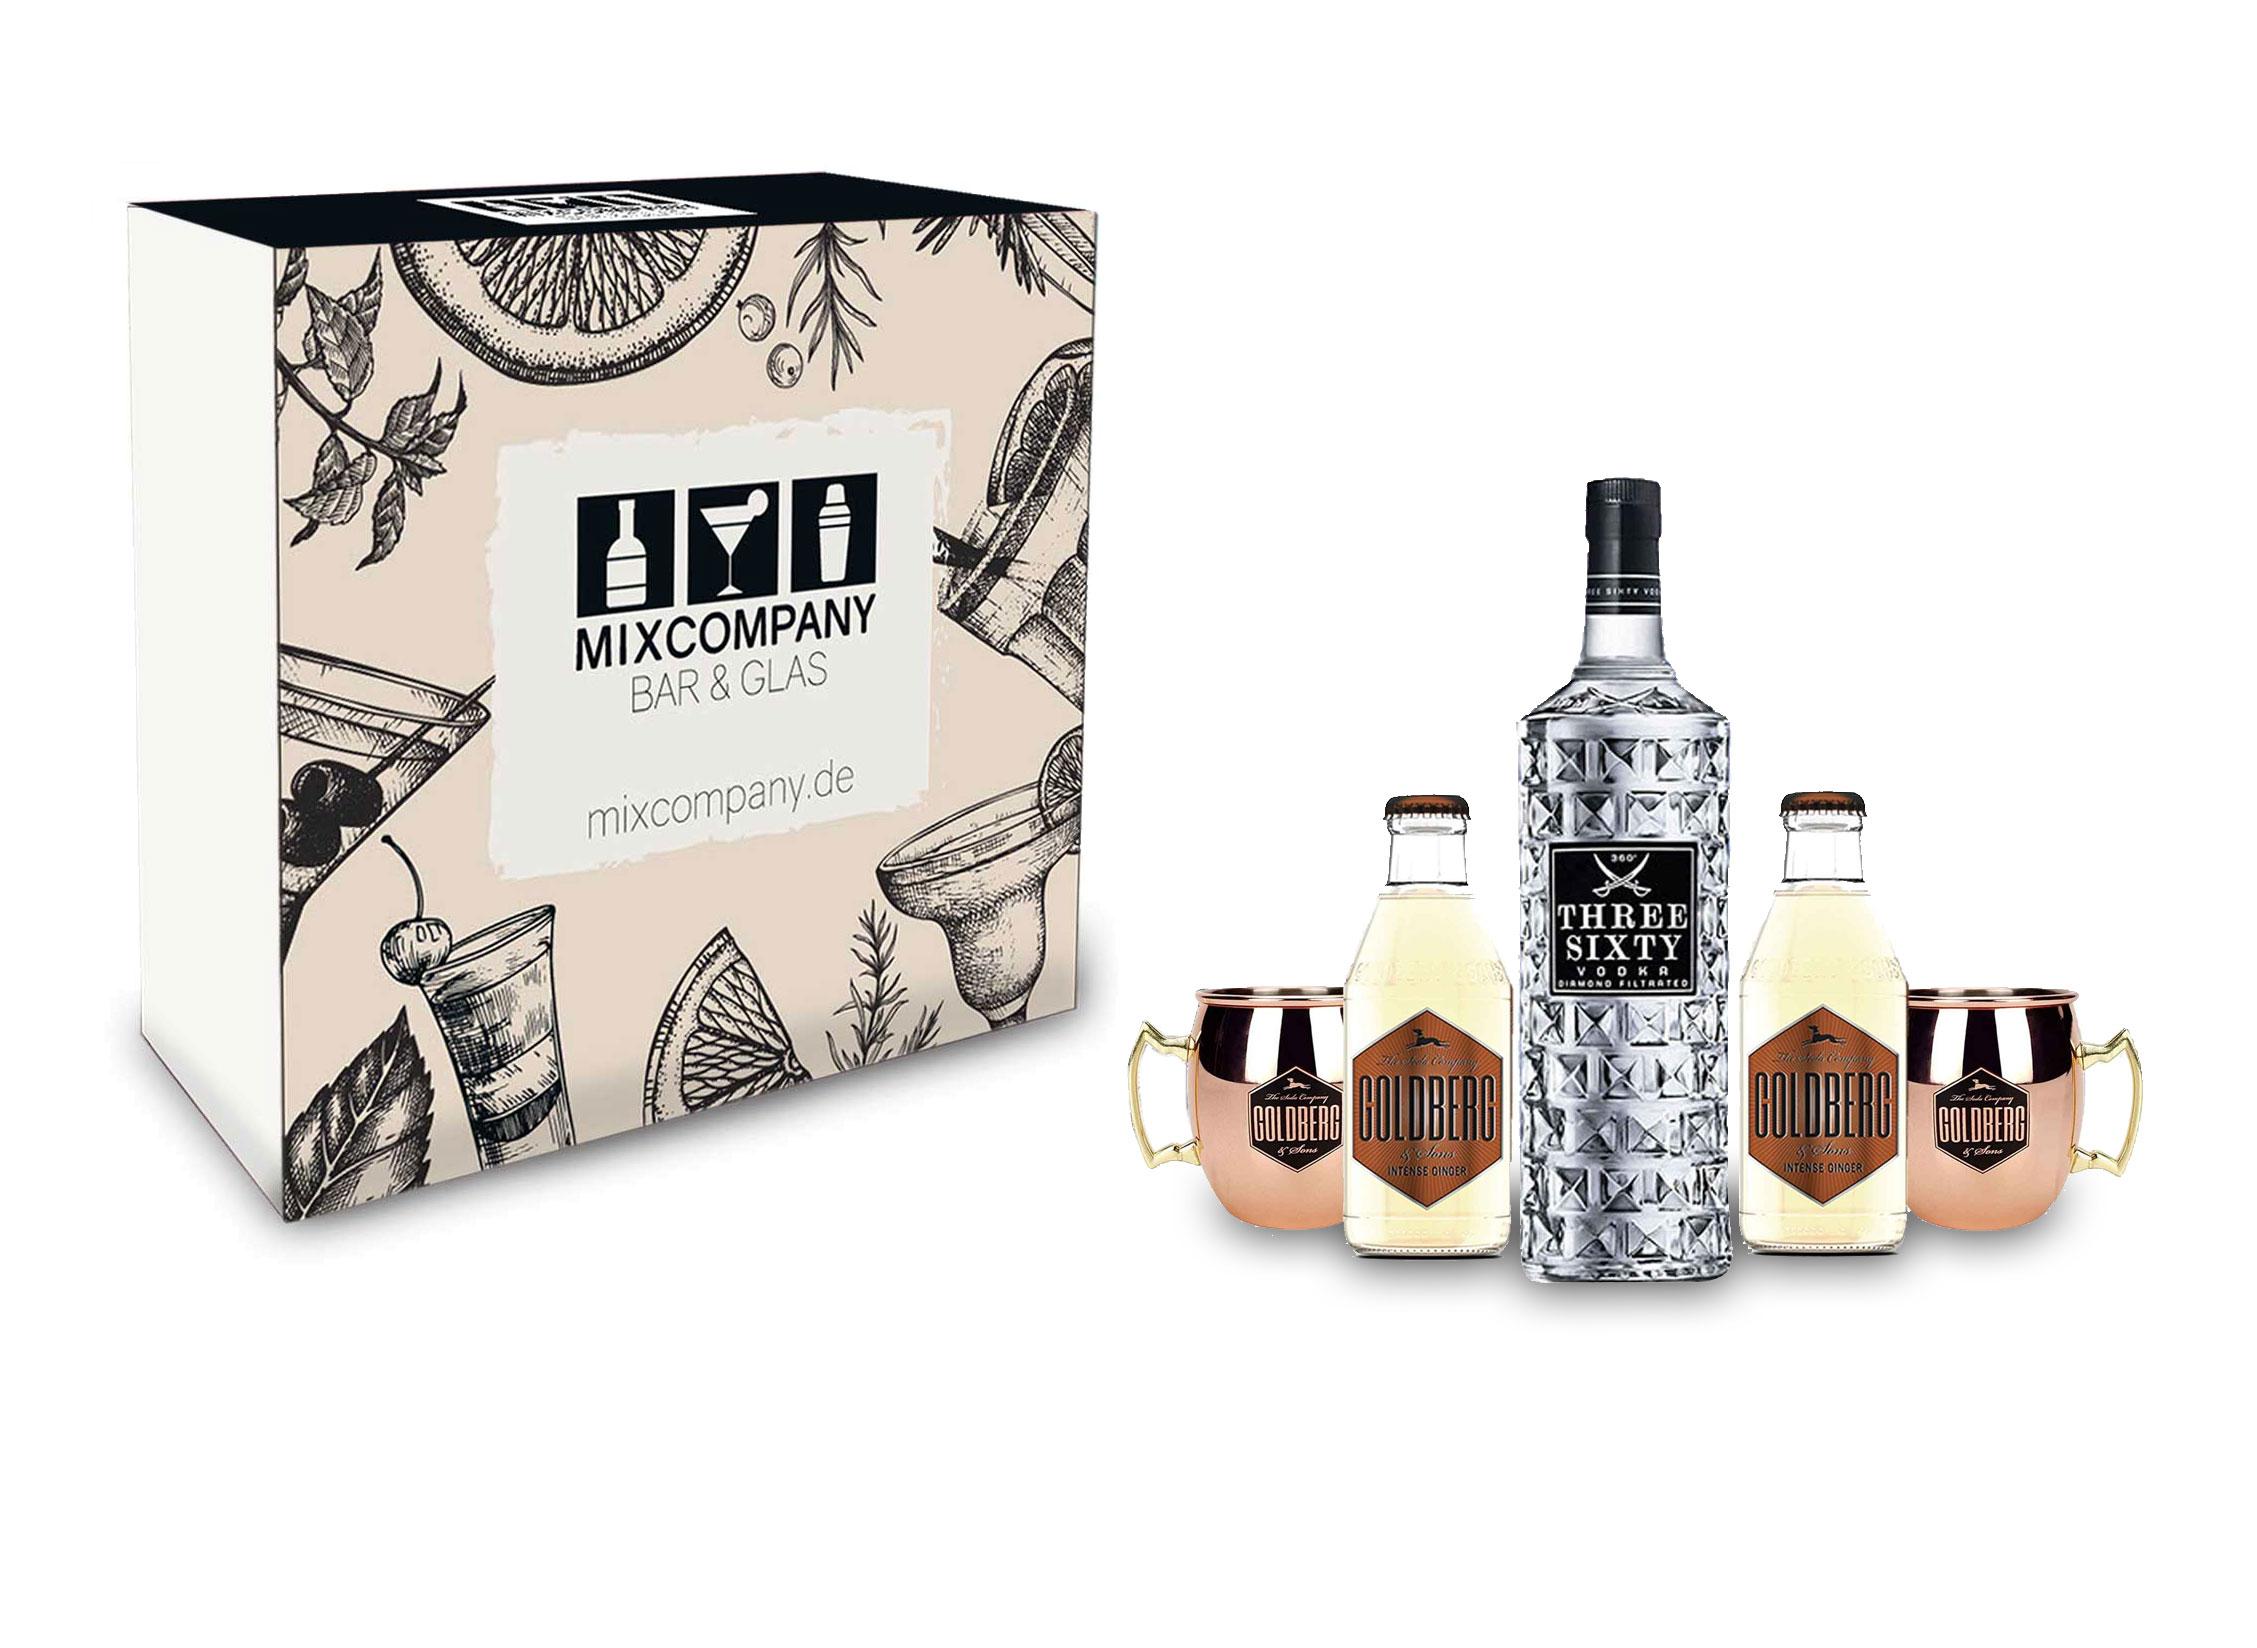 Moscow Mule Set / Geschenkset - Three Sixty Vodka 1L (37,5% Vol) + 2x Goldberg Kupferbecher + 2x Goldberg Intense Ginger 200ml - Inkl. Pfand MEHRWEG